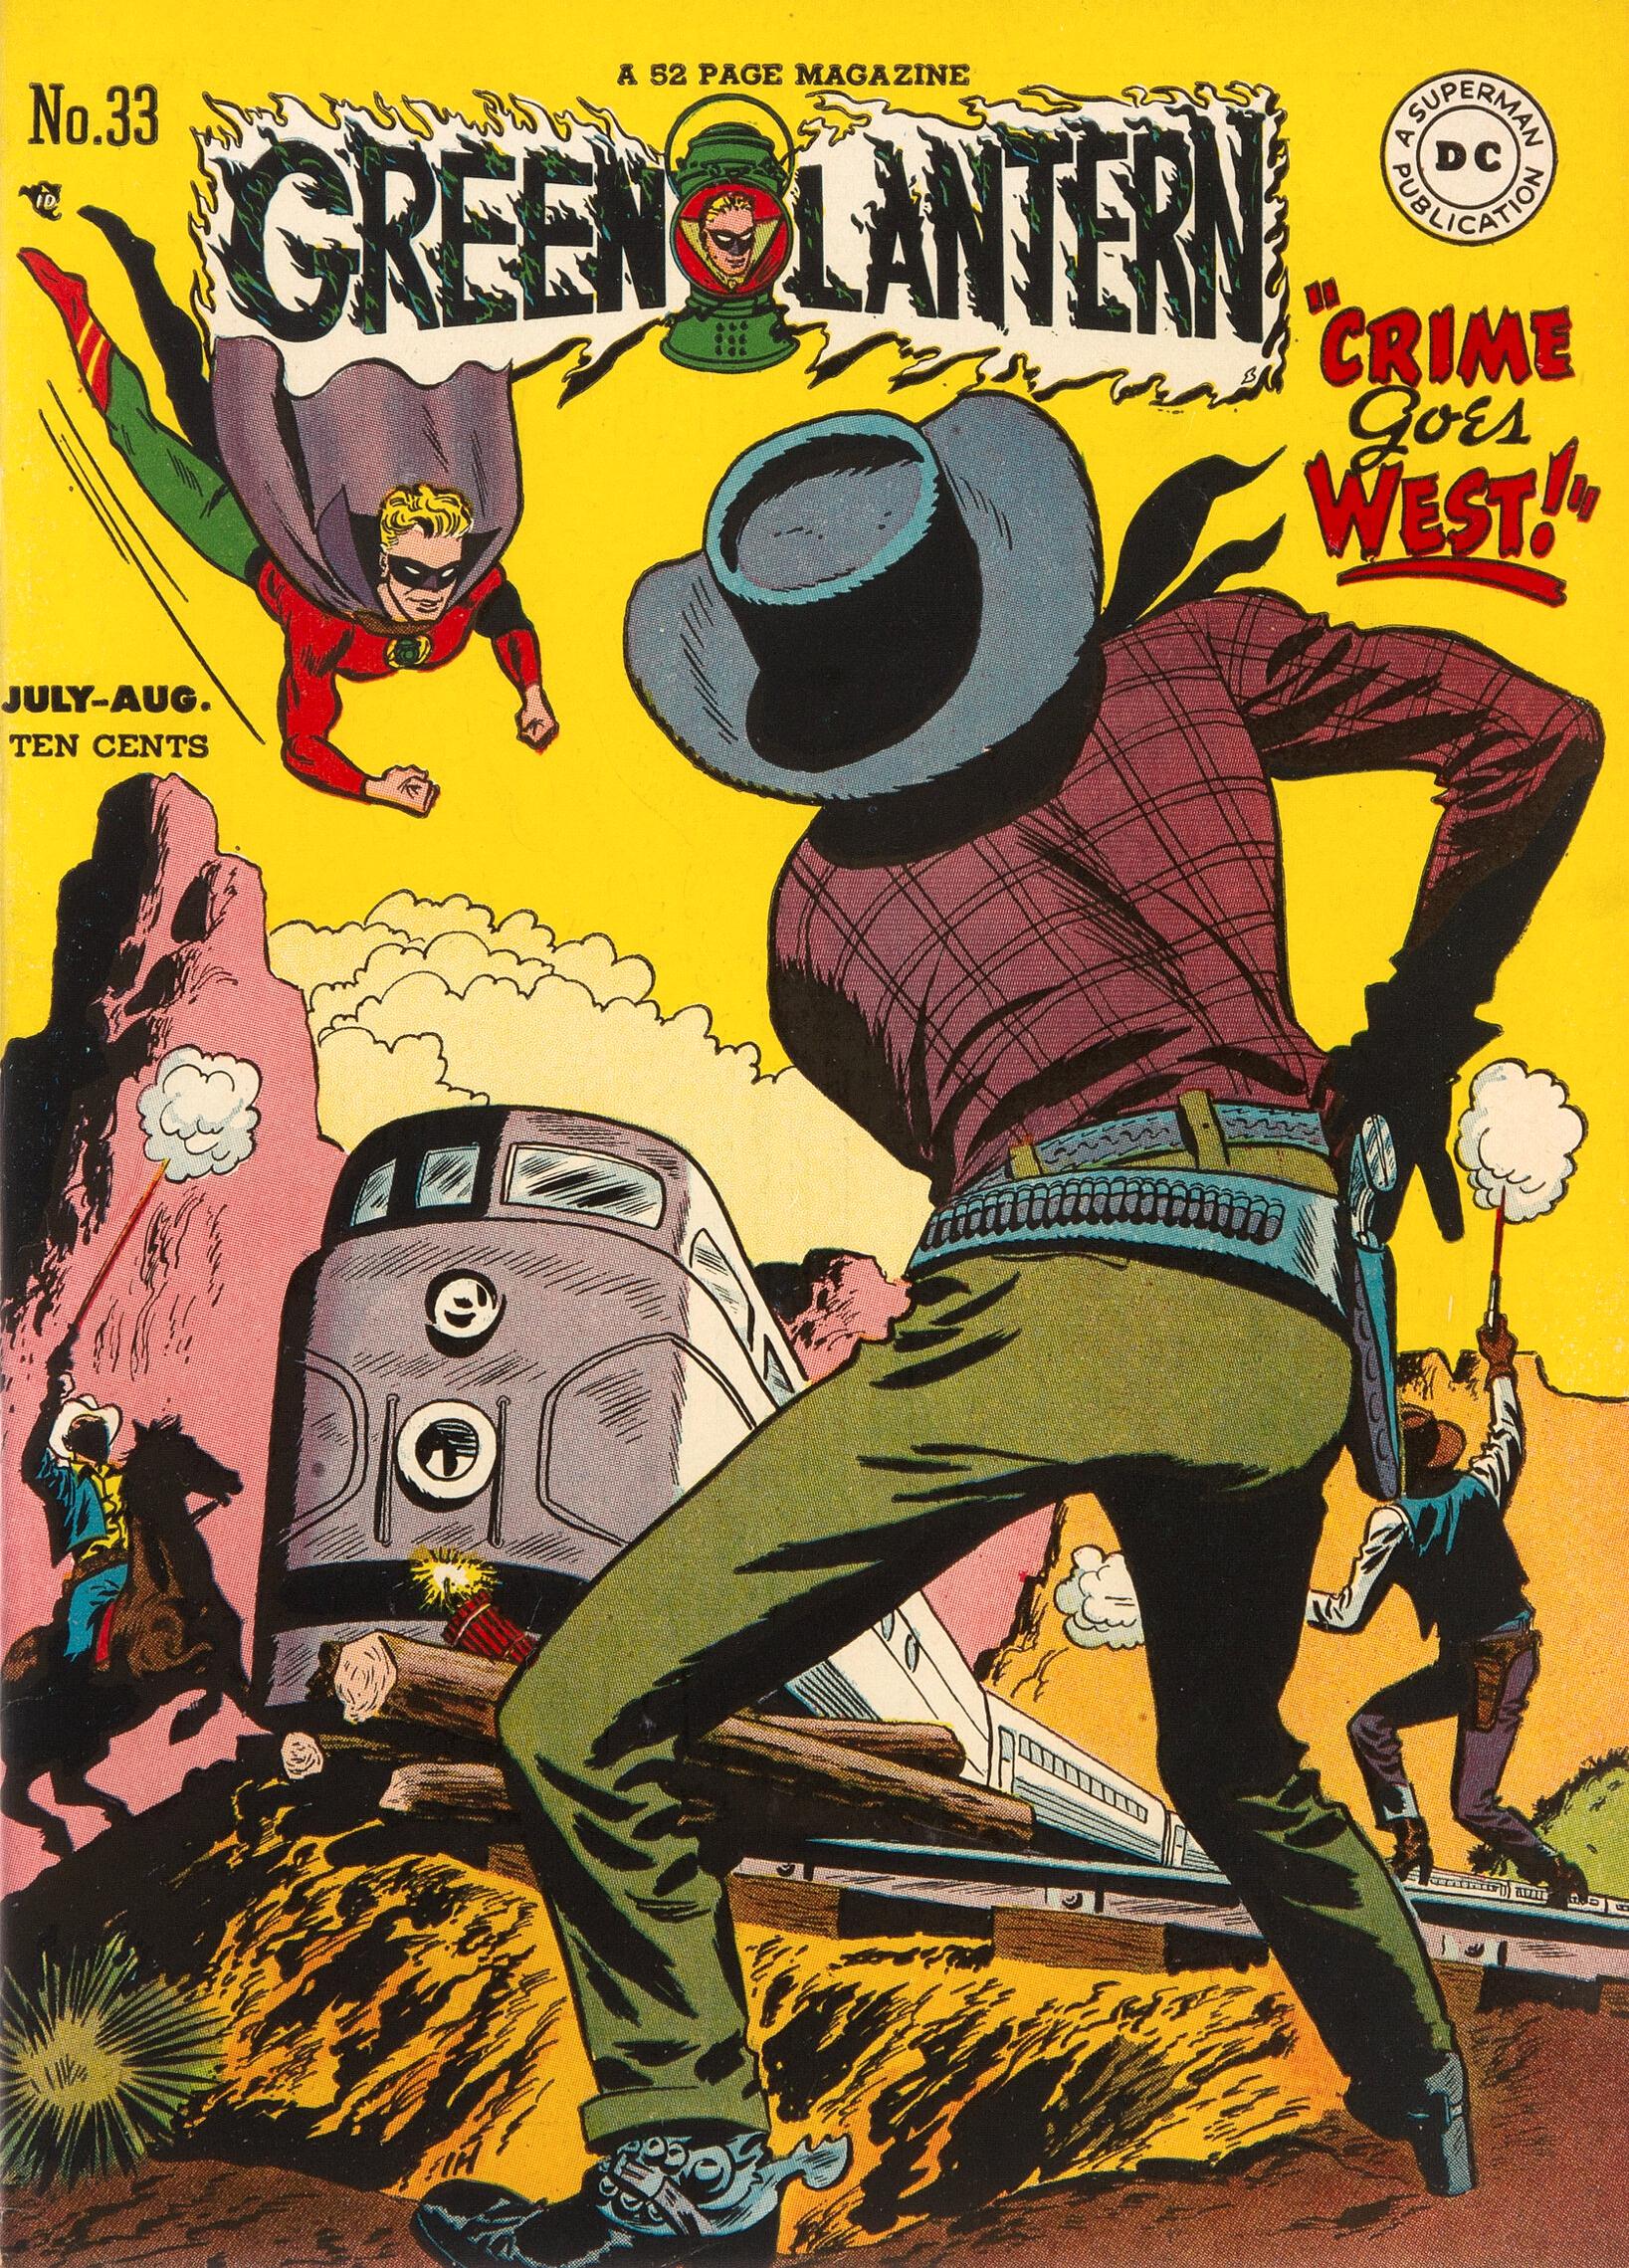 Green Lantern Vol 1 33